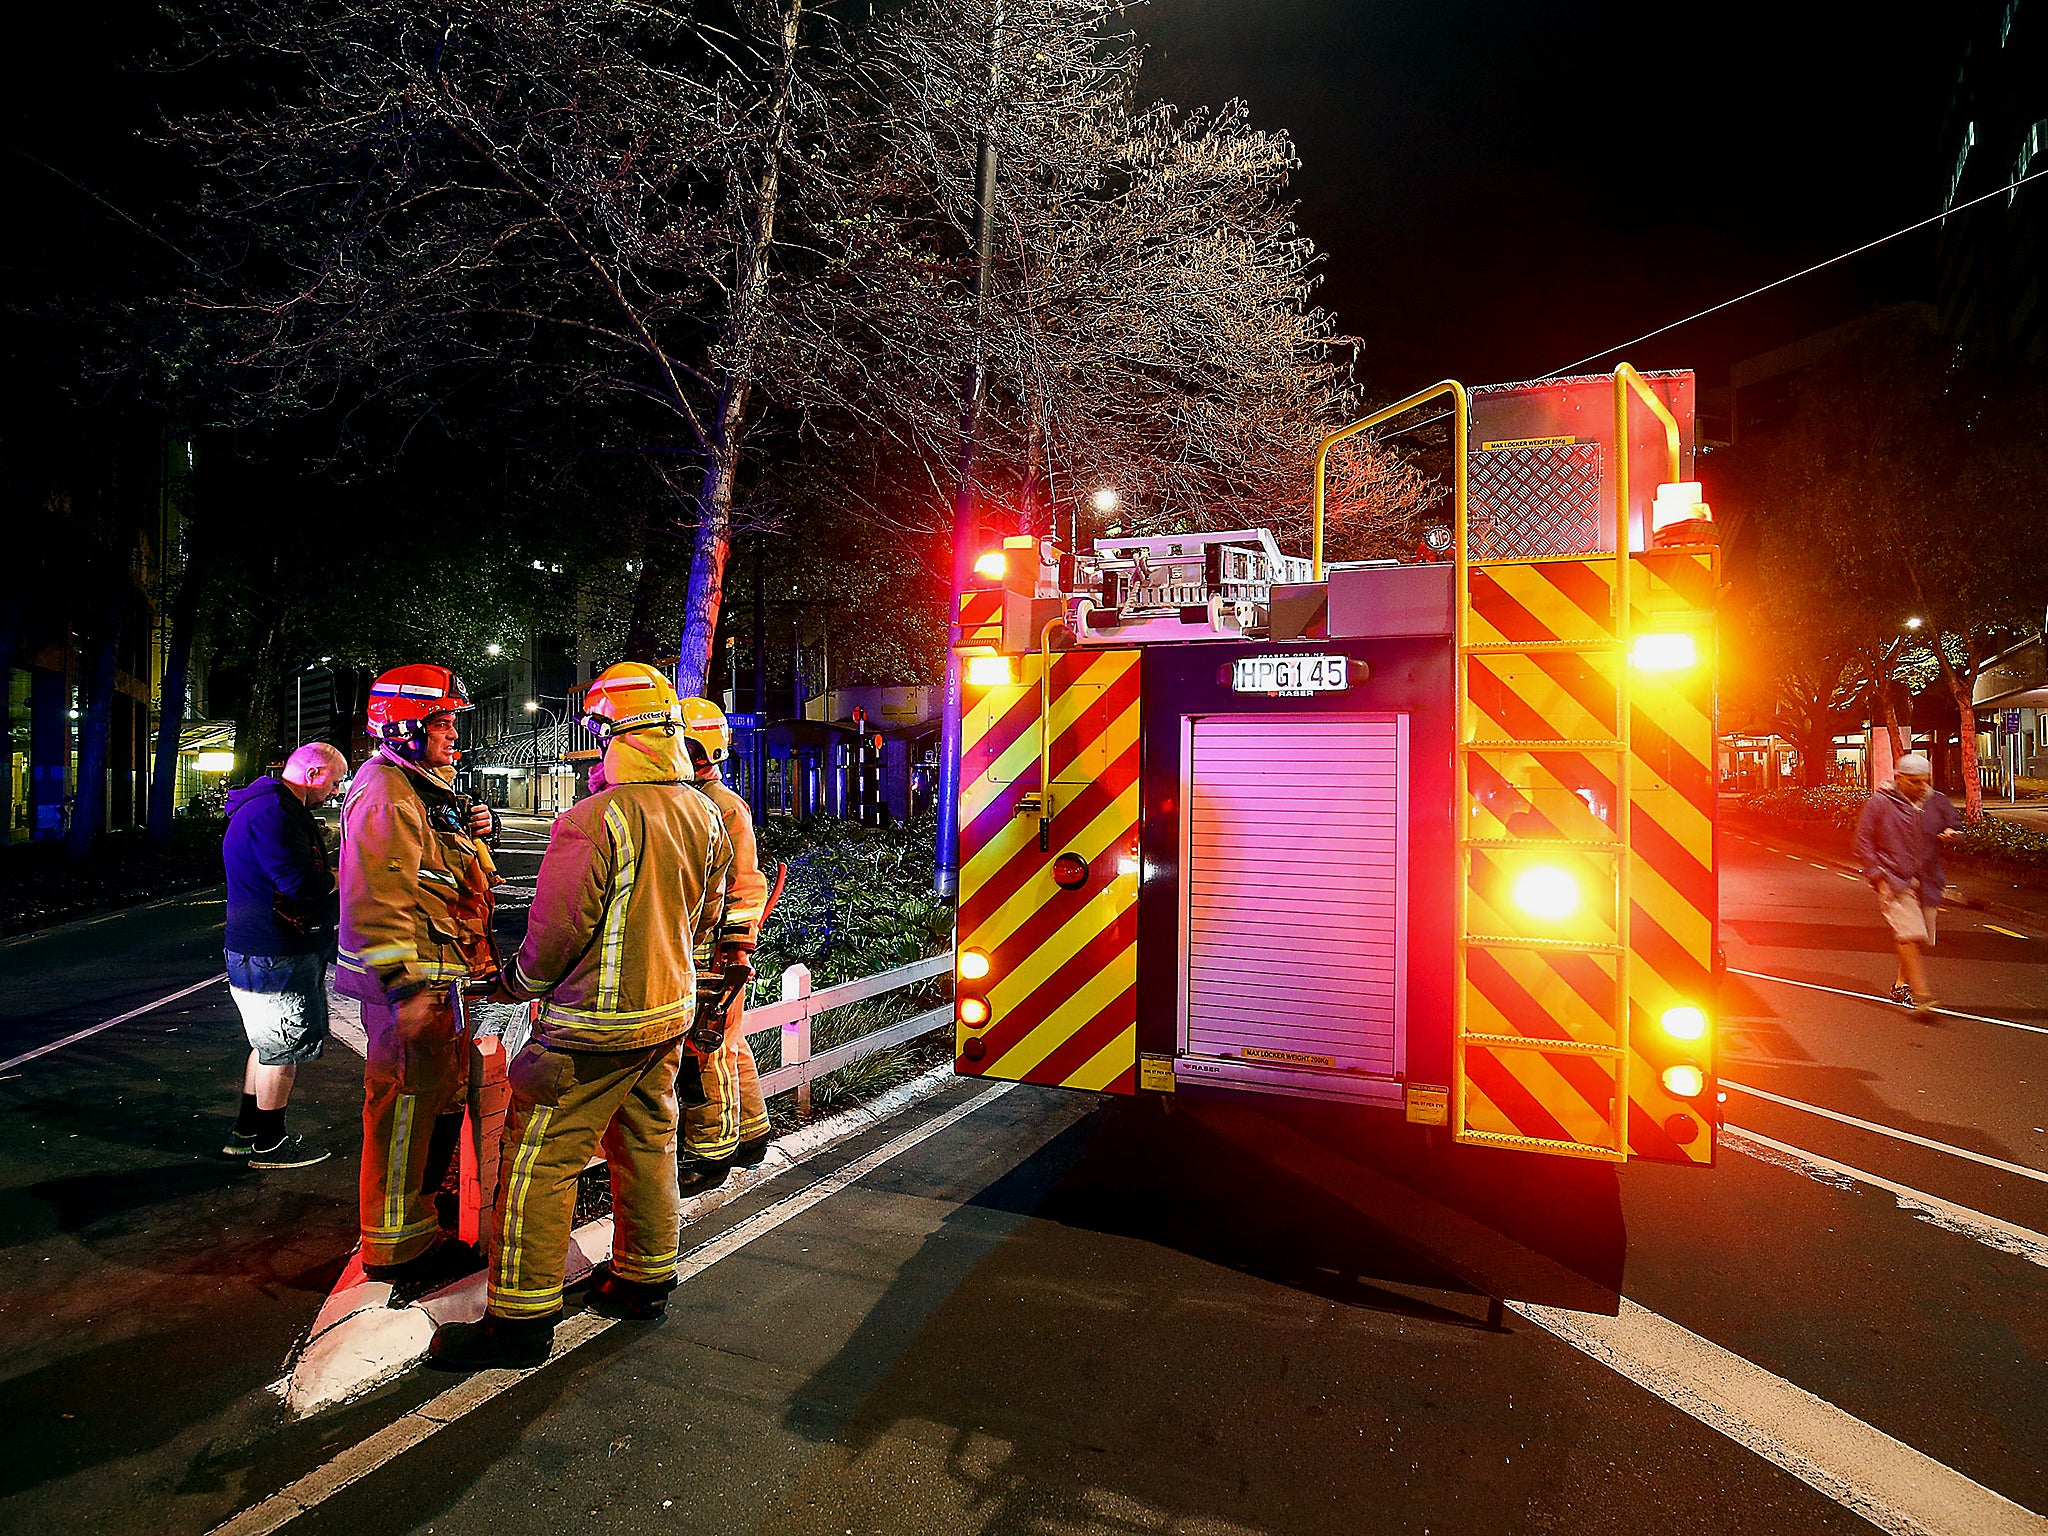 New Zealand News Twitter: New Zealand Radio Reporter Calmly Continues Broadcast